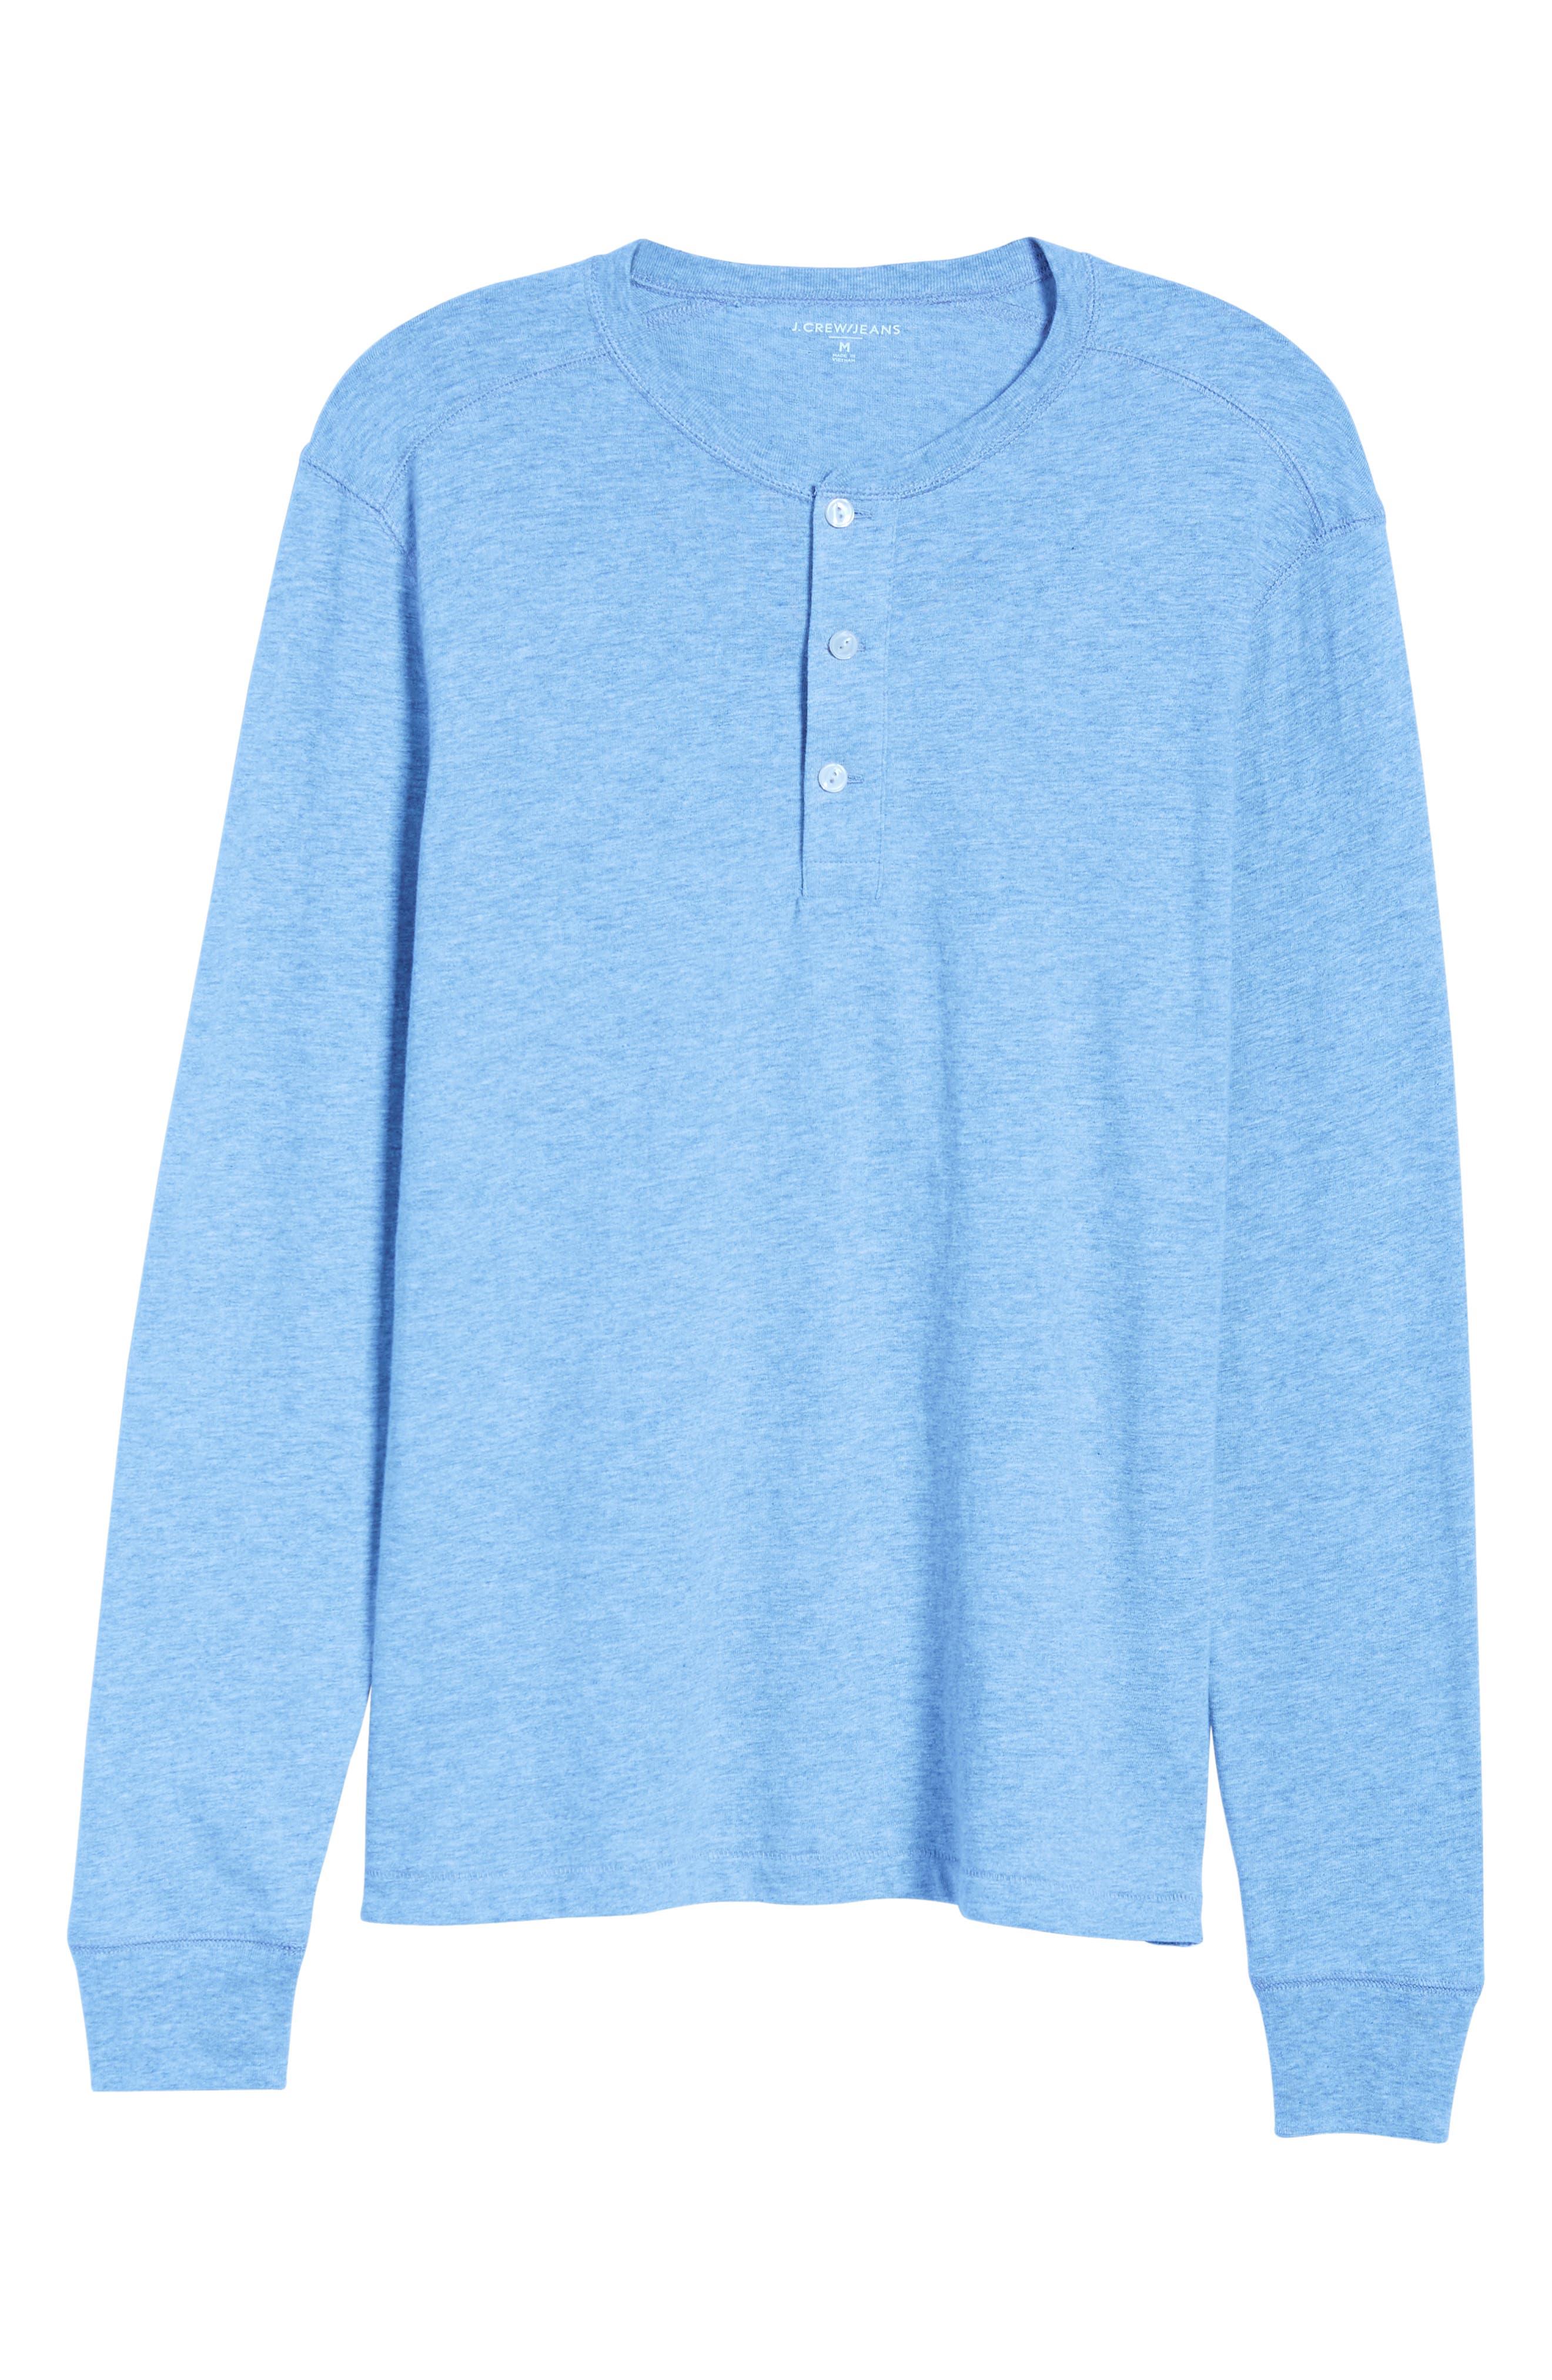 Slim Fit Garment Dyed Slub Cotton Henley,                             Alternate thumbnail 6, color,                             020